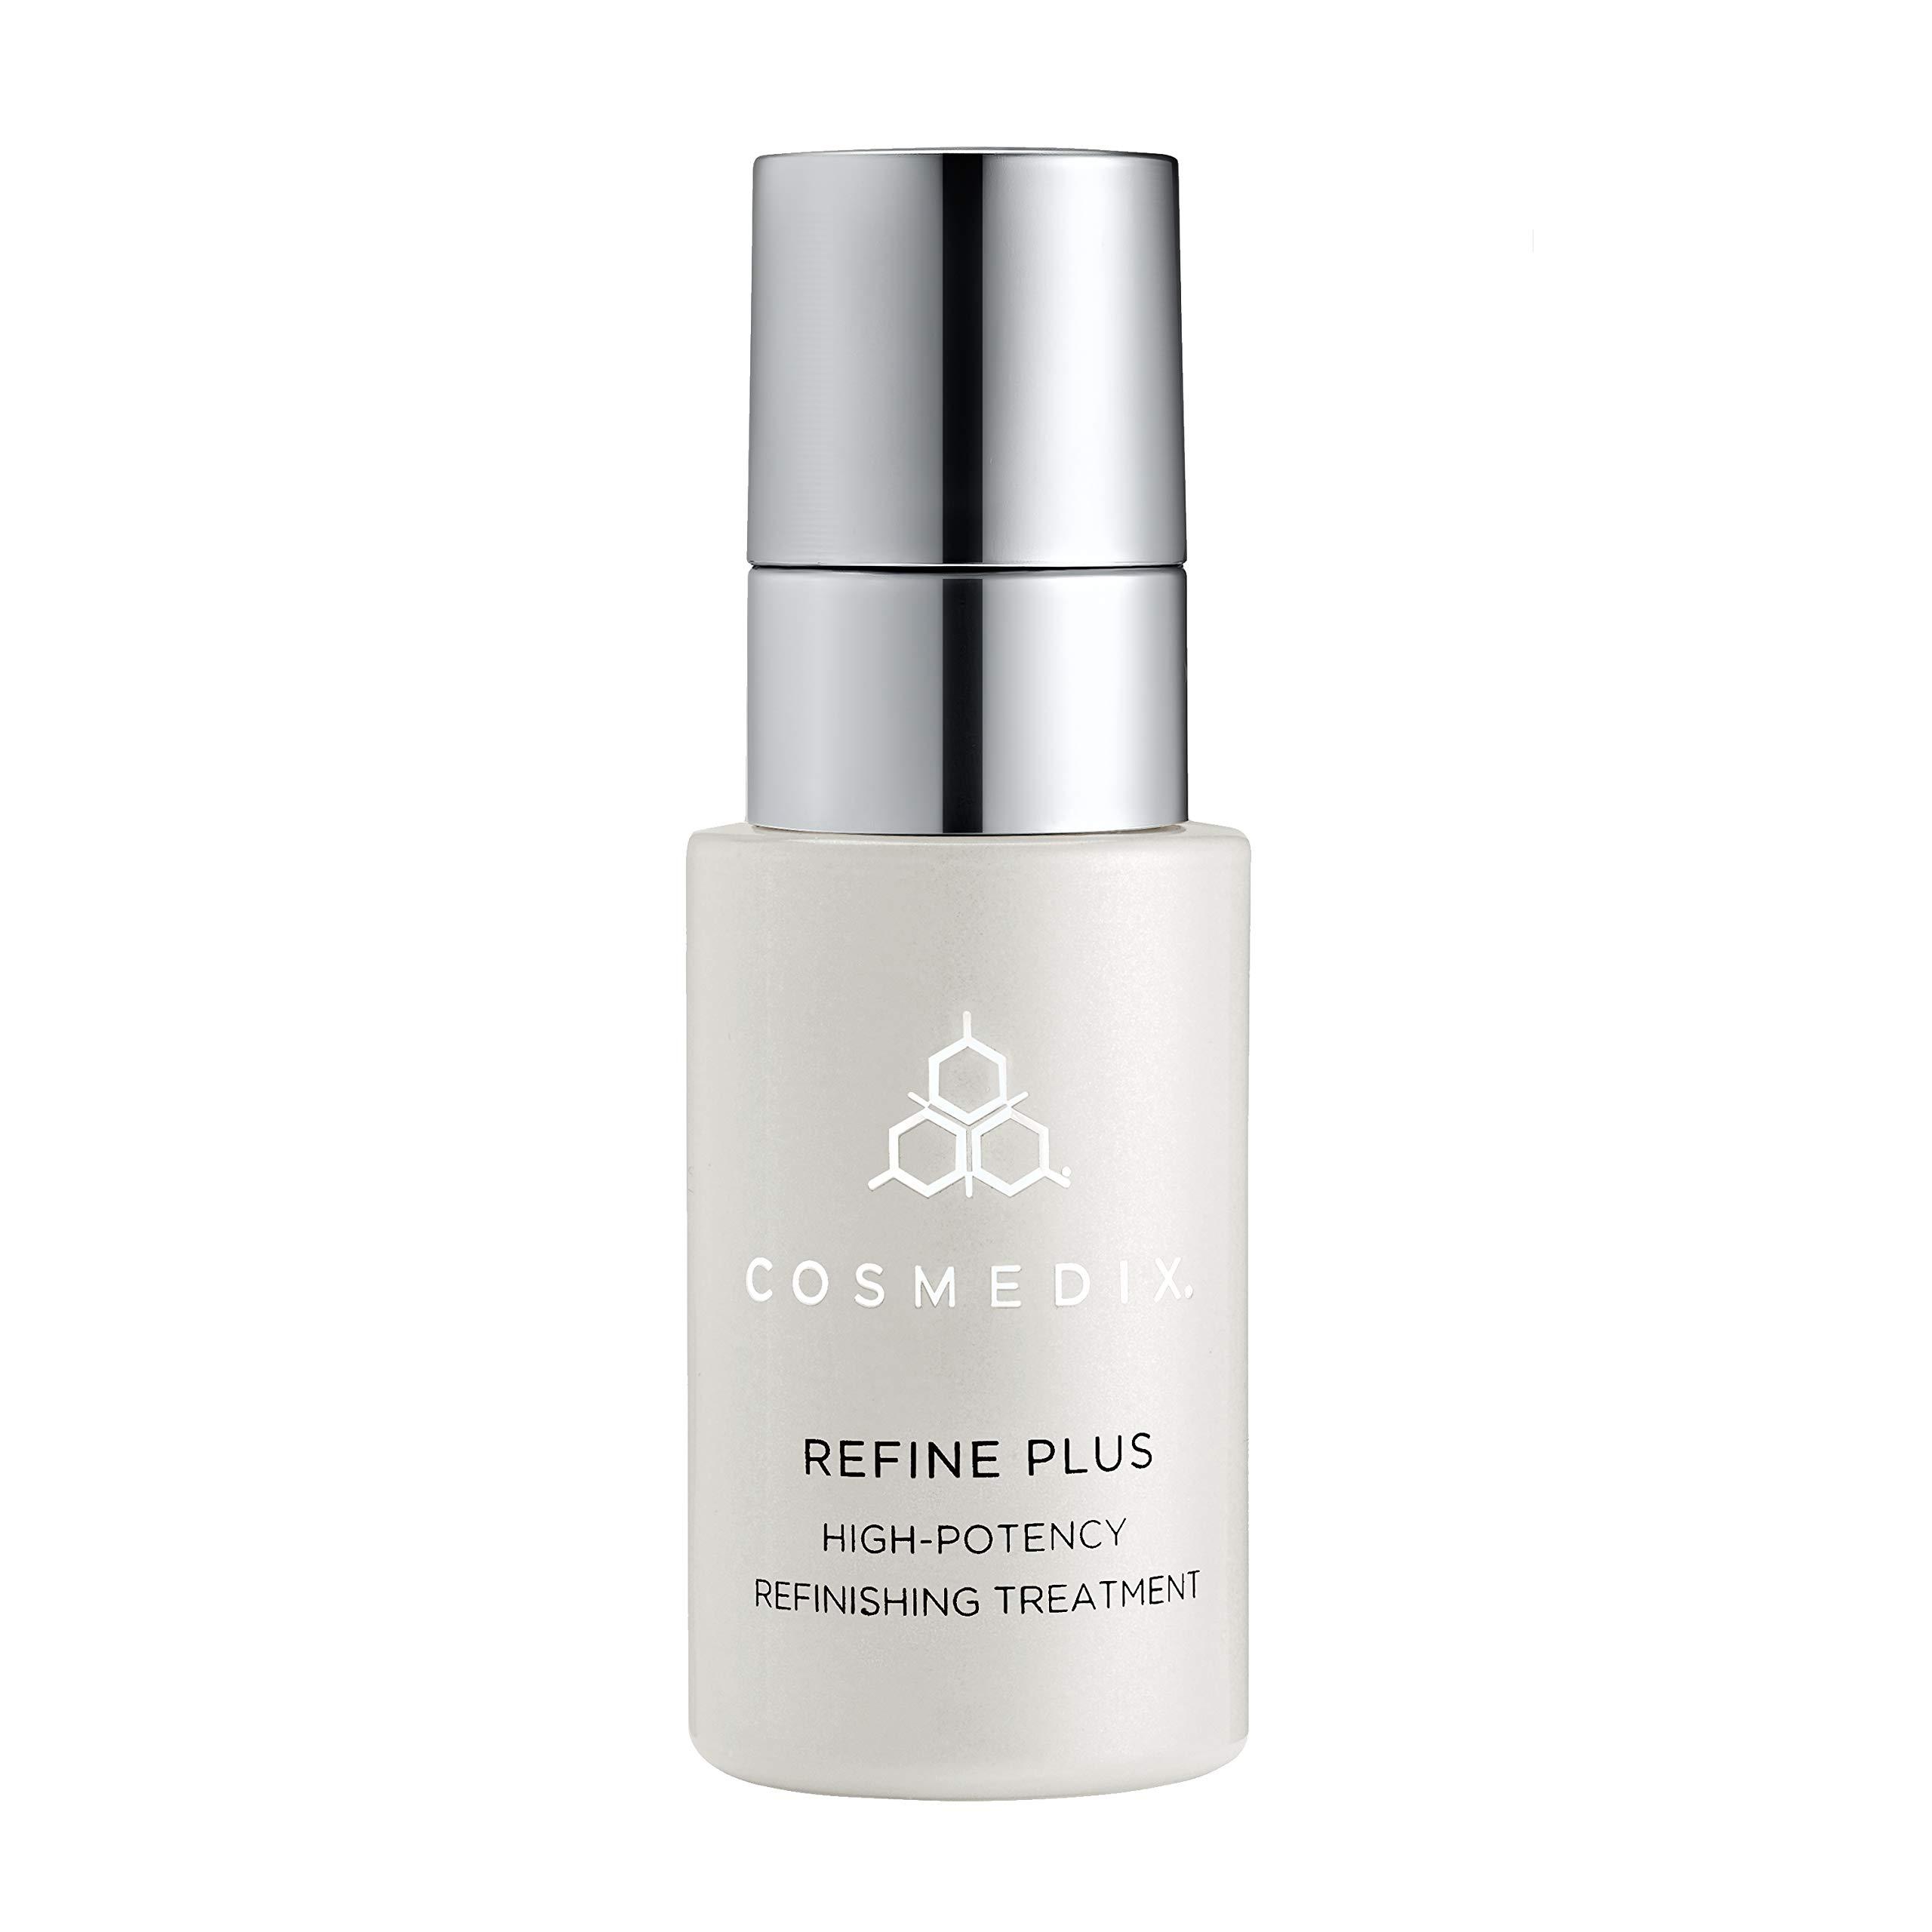 COSMEDIX Refine Plus High-Potency Refininshing Treatment, Anti Wrinkle Under Eye Serum, 0.5 Fl Oz